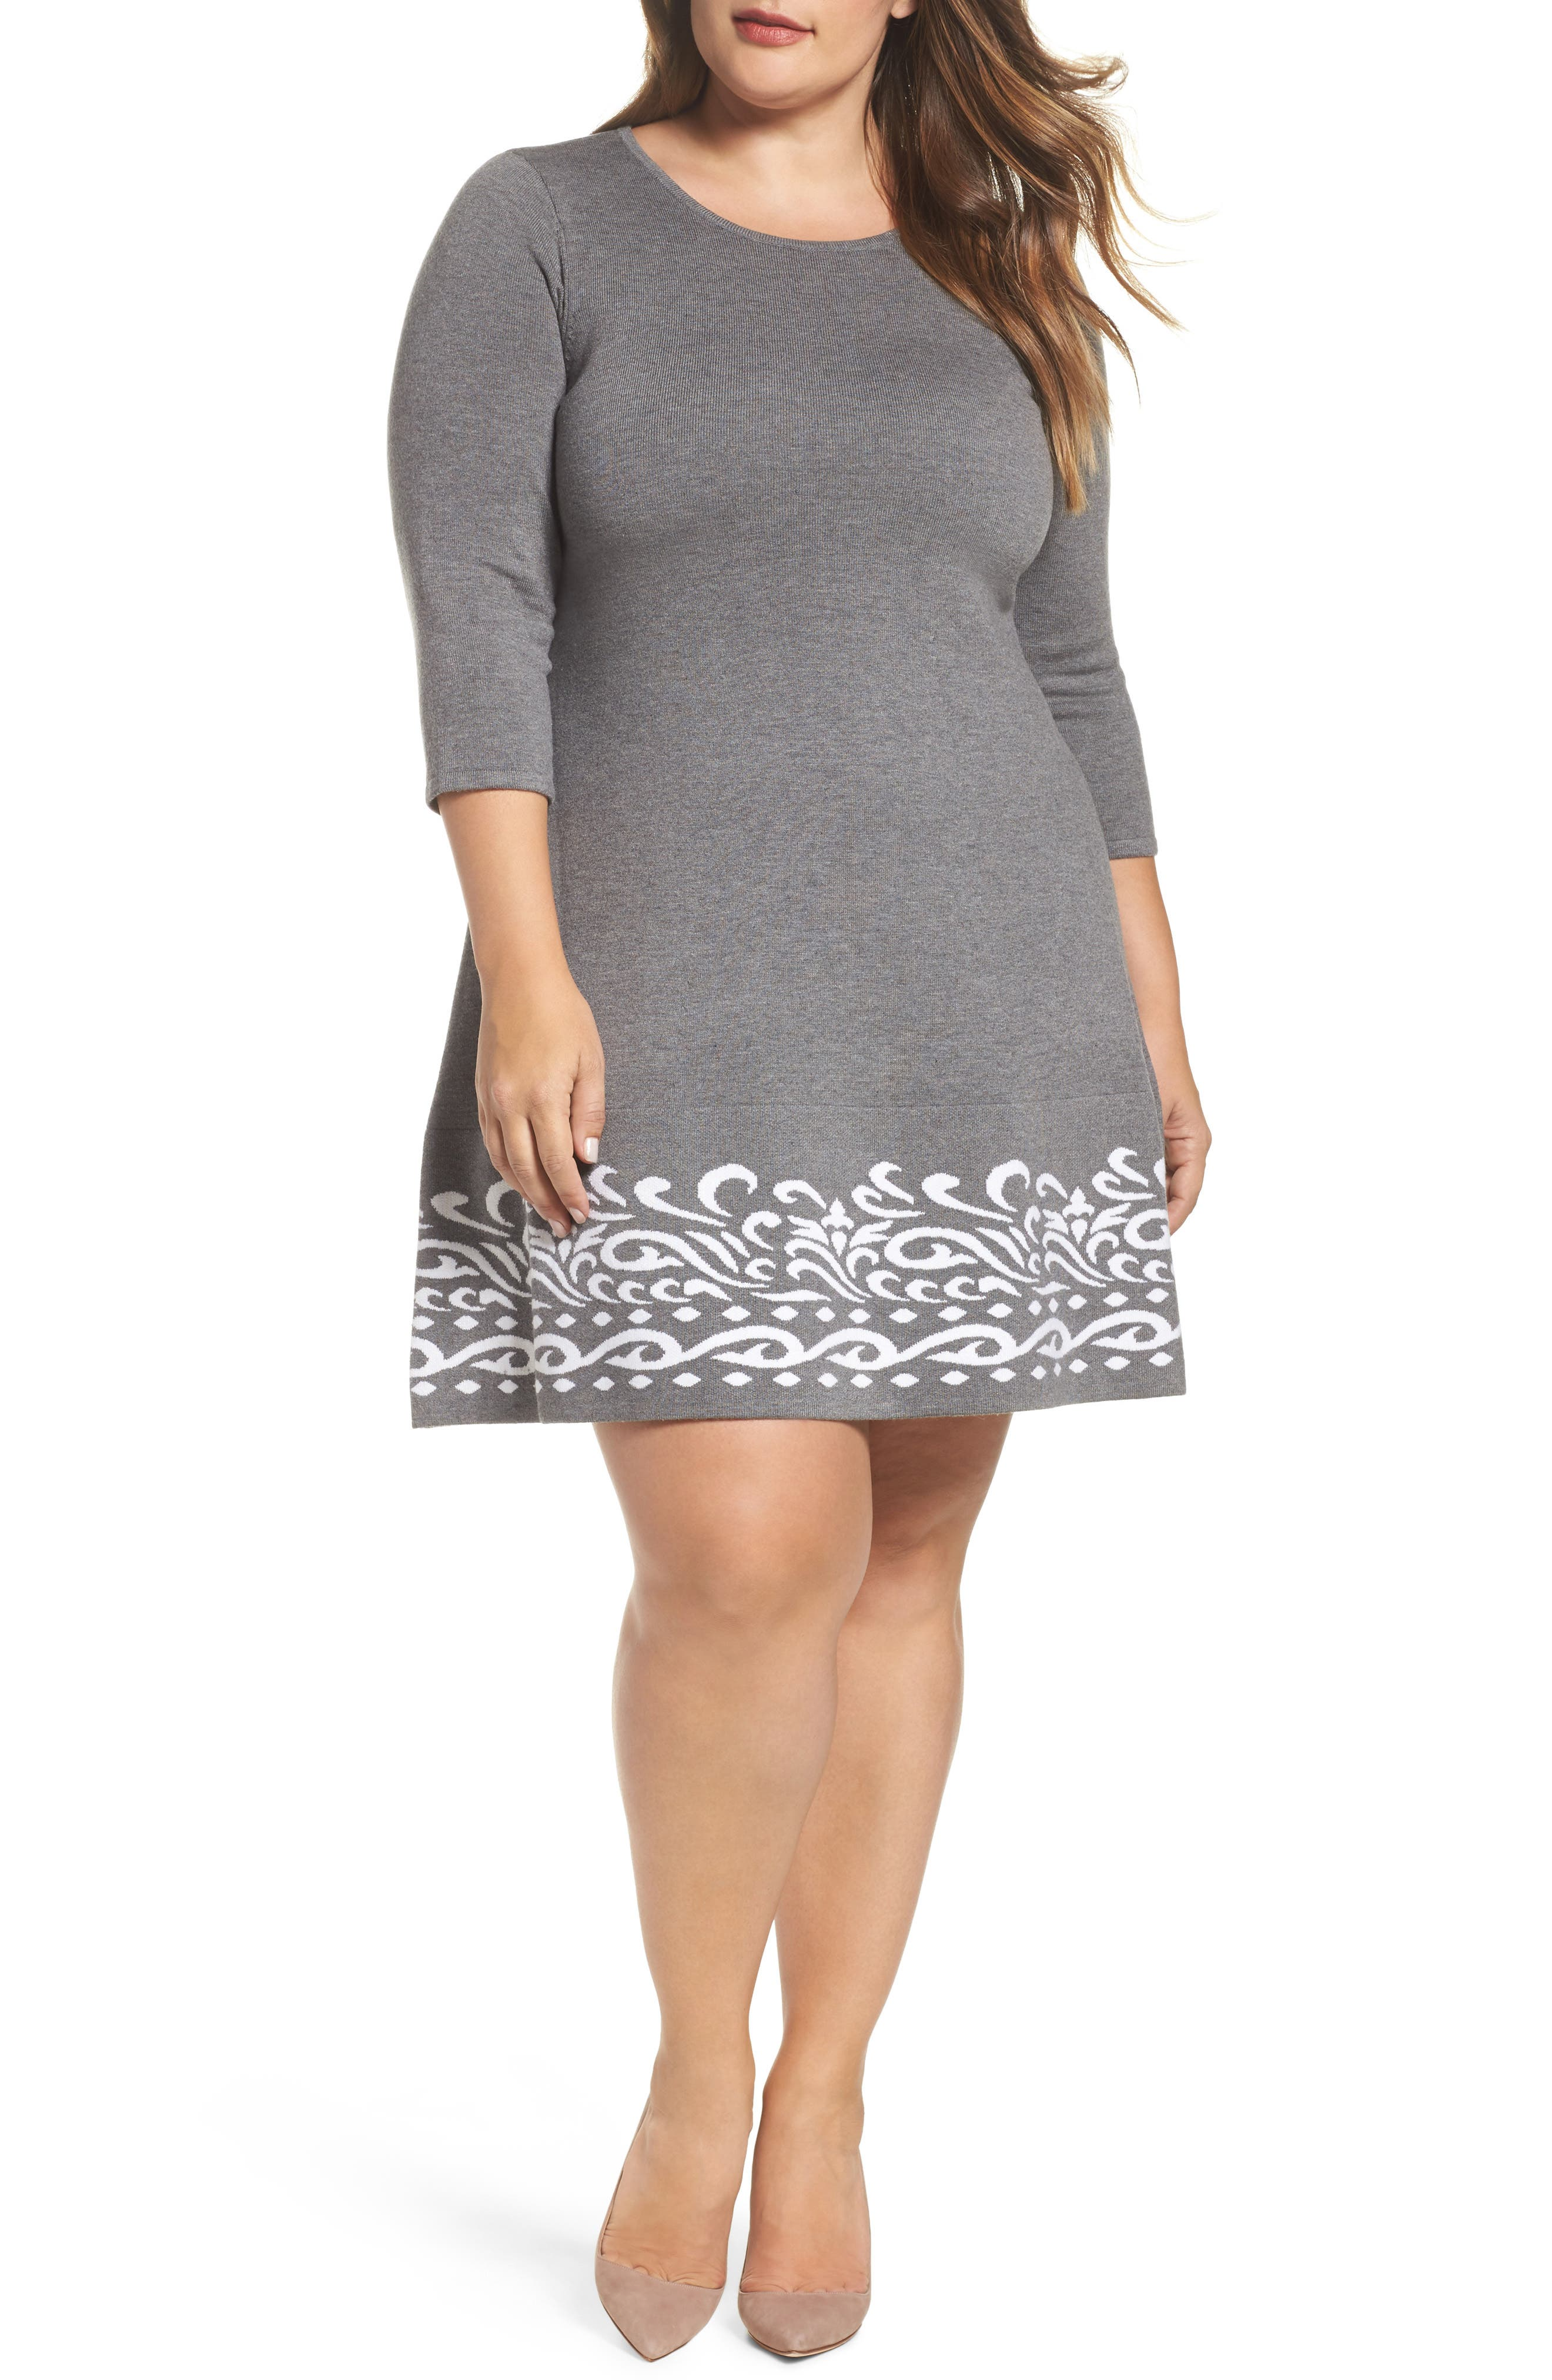 Alternate Image 1 Selected - Eliza J A-Line Sweater Dress (Plus Size)